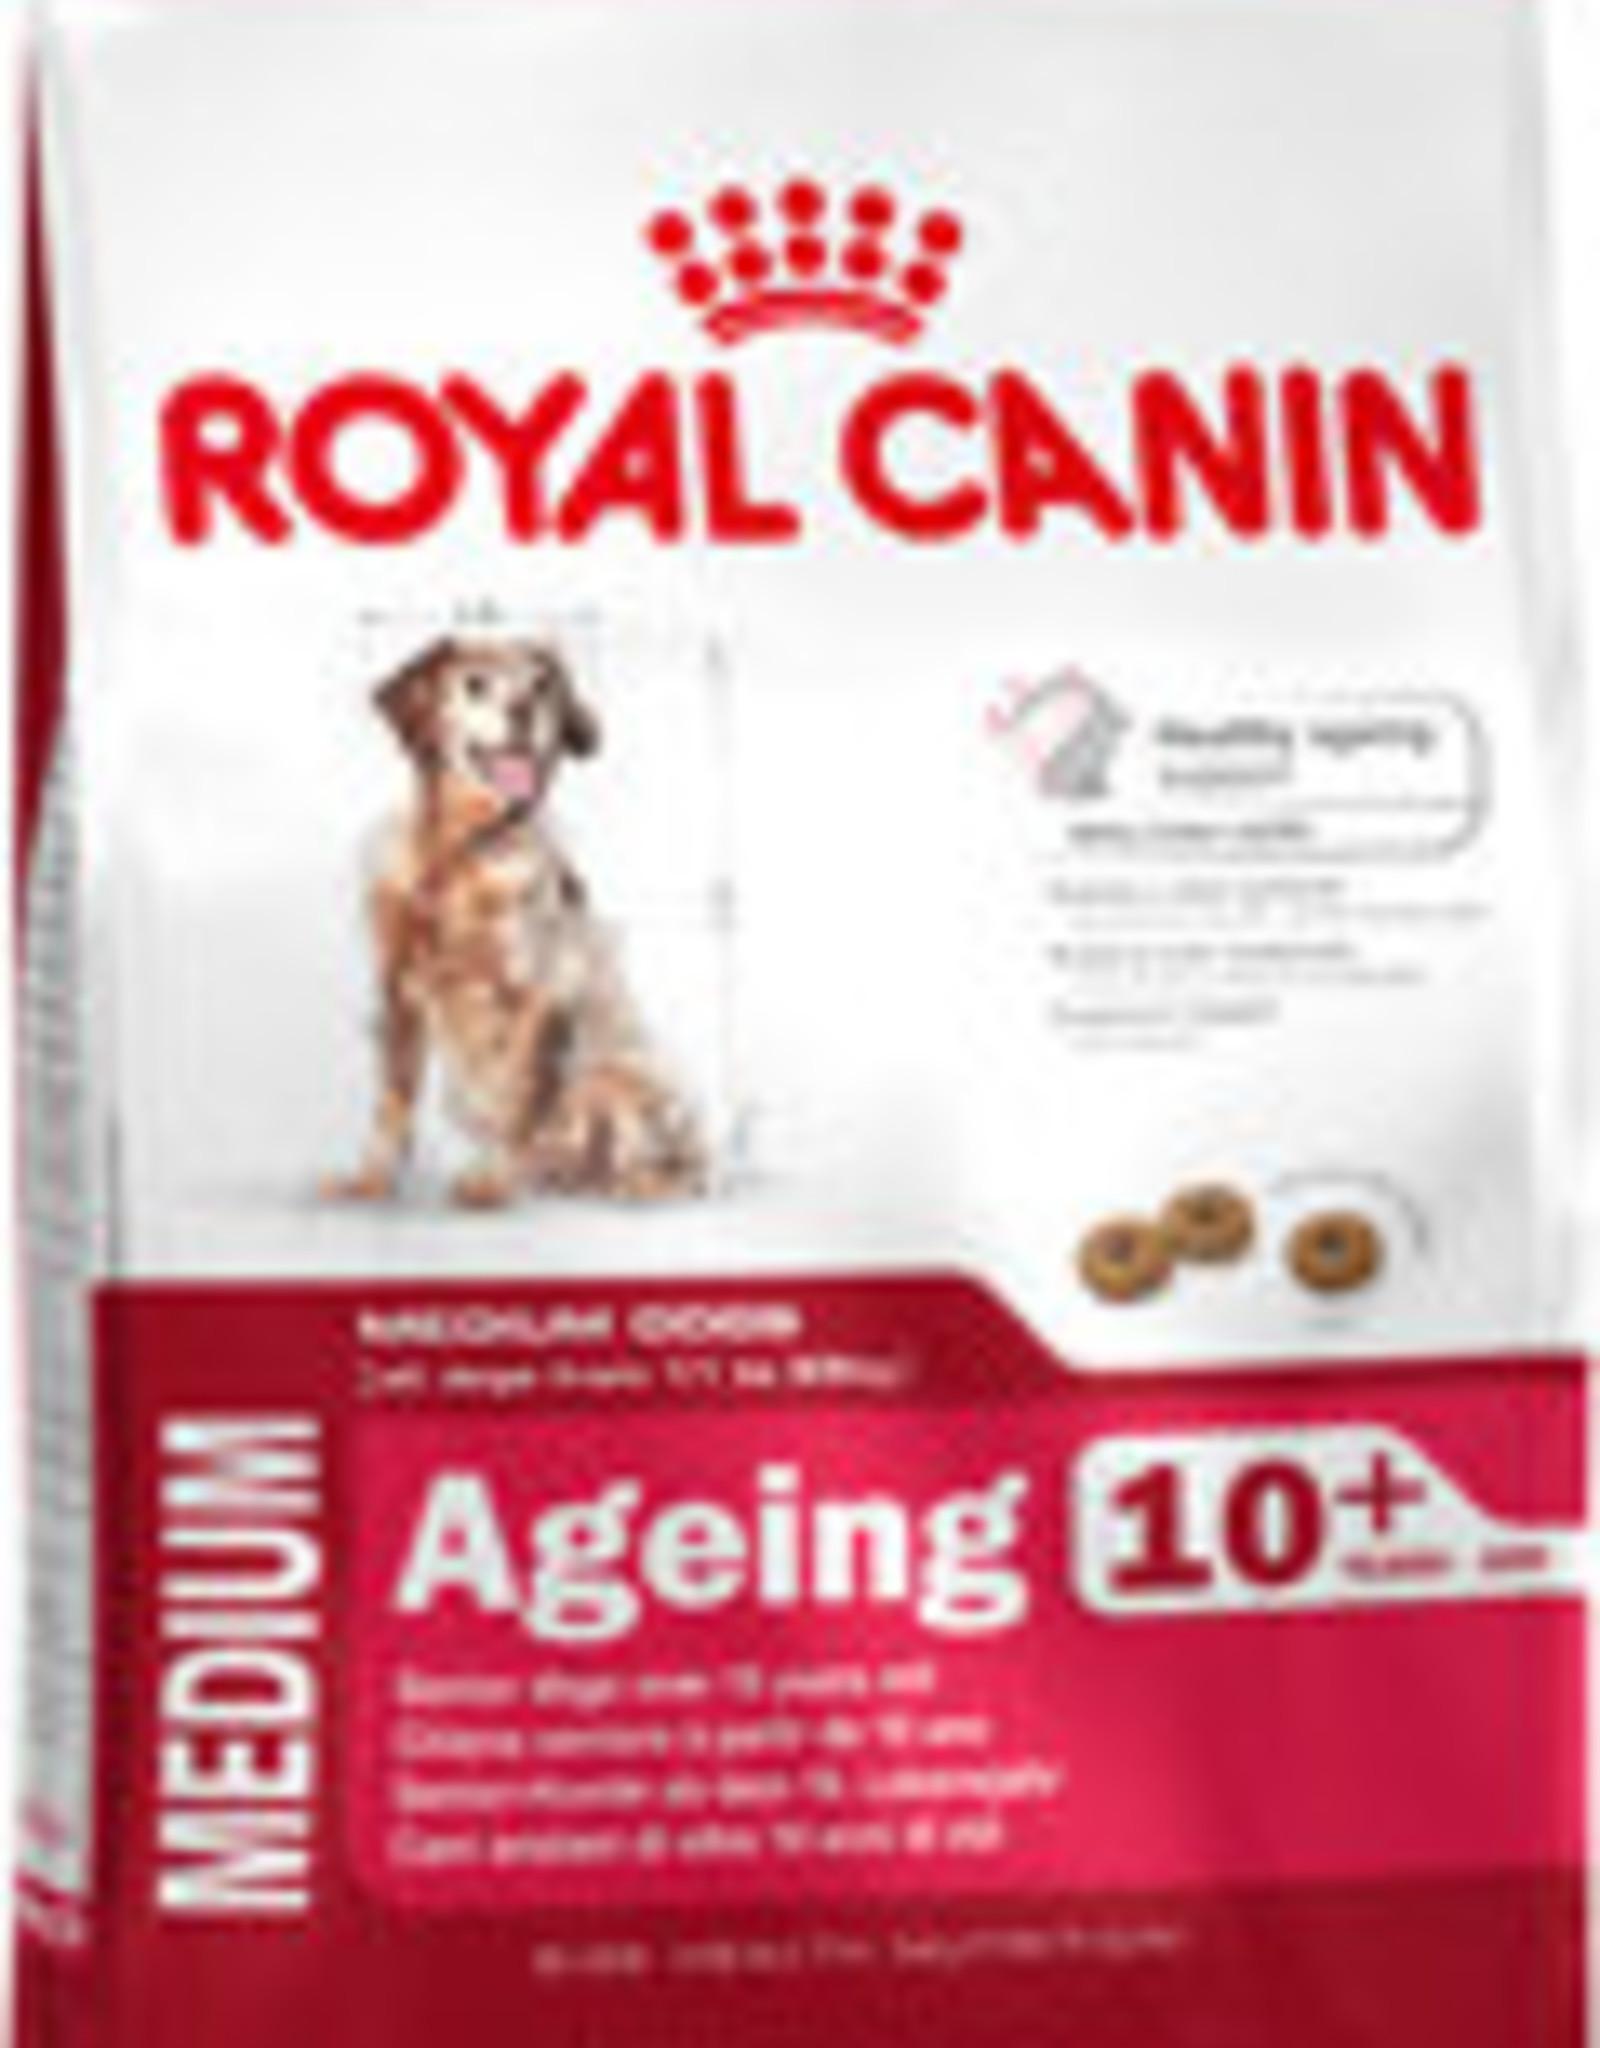 Royal Canin Royal Canin Bhn Medium Ageing 10+ Chien 15kg